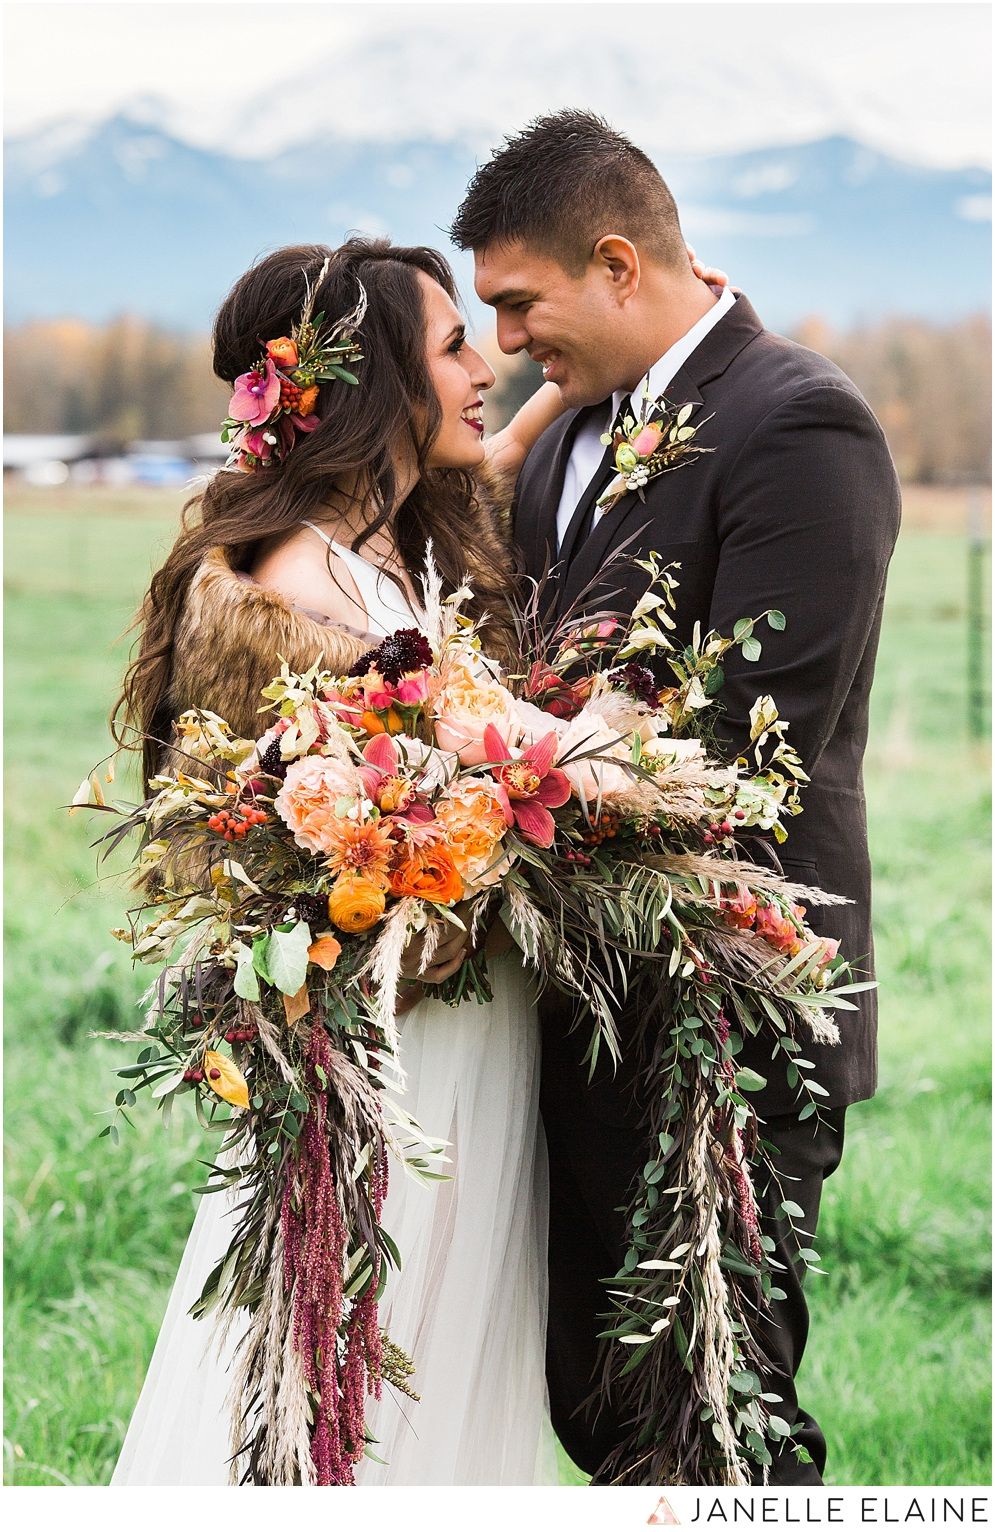 elopement-wedding-photographer-seattle washington-photographers-30.jpg